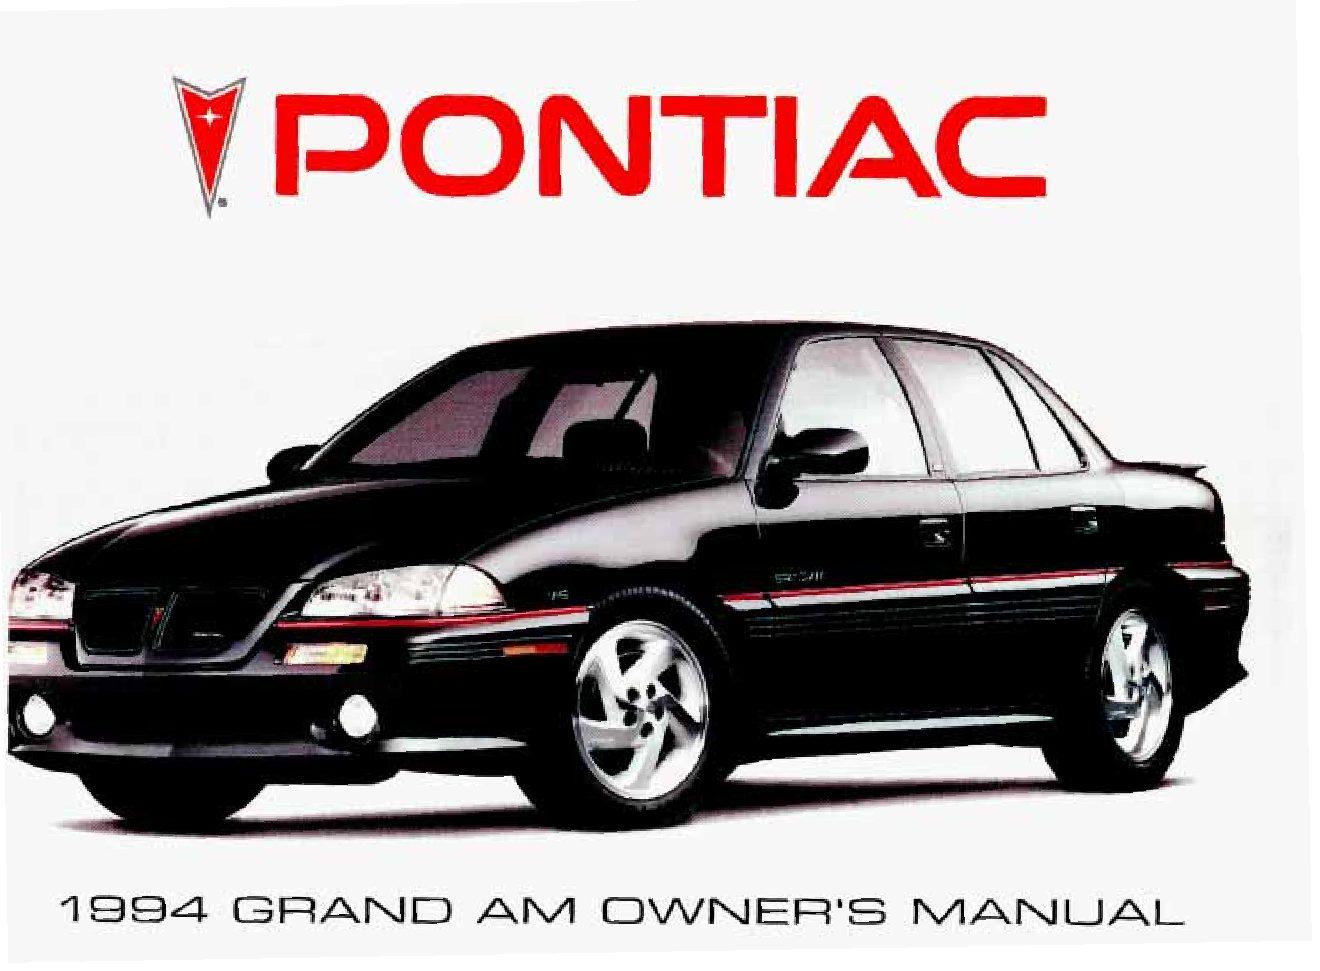 2002 pontiac grand am owners manual open source user manual u2022 rh dramatic varieties com 1993 Pontiac Grand AM 2002 Pontiac Grand AM